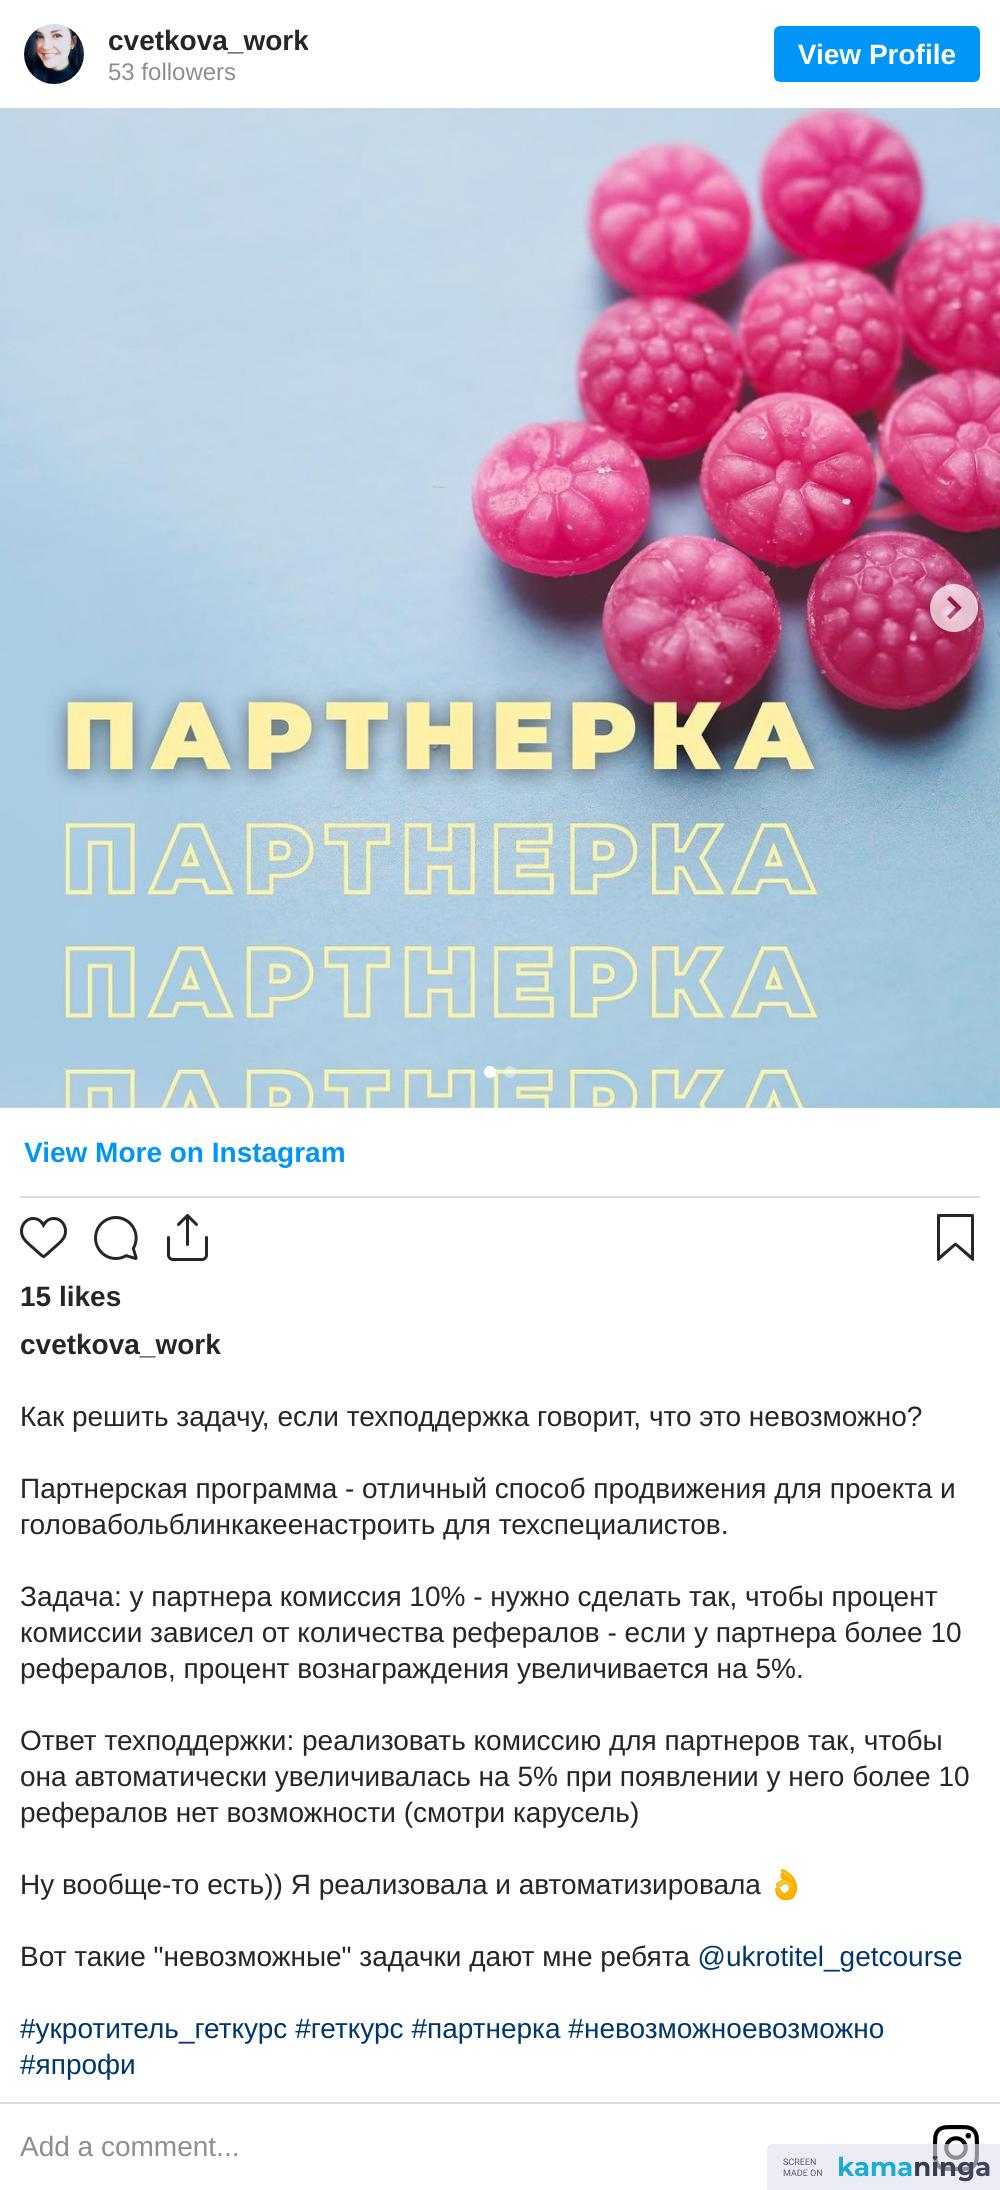 https://www.instagram.com/p/CP7j_tSFyvC/